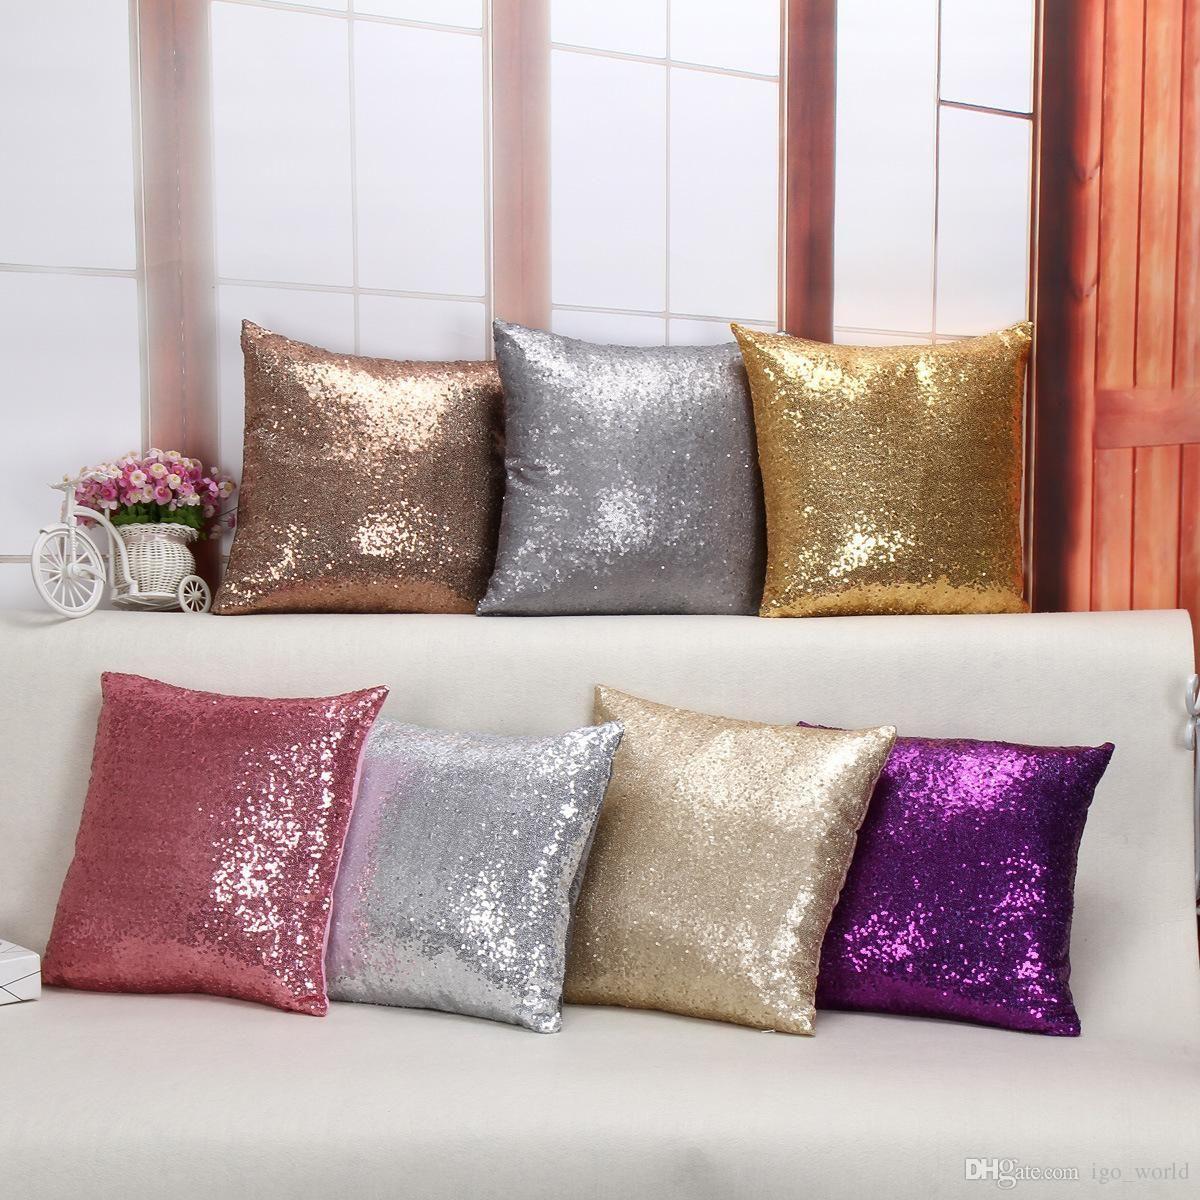 2016 Sequin Cushion Cover 40 40cm Multicolors Solid Color Glitter